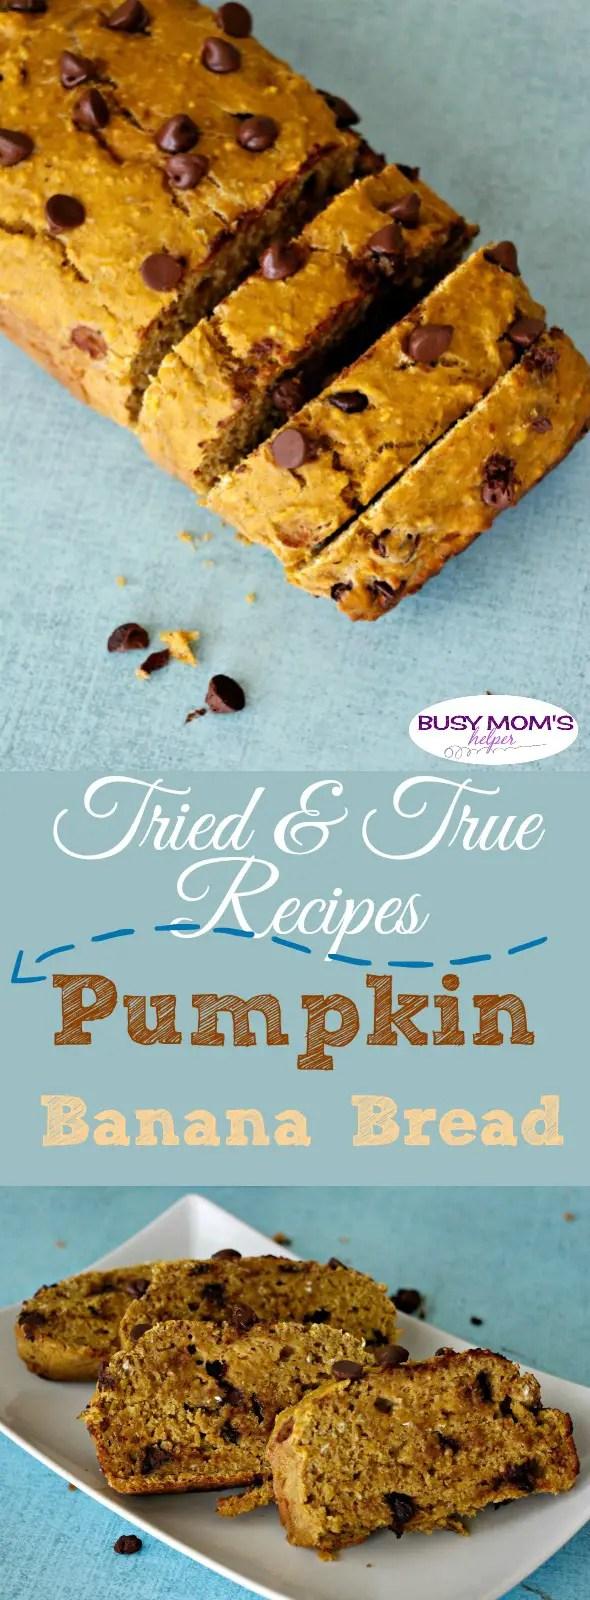 Tried & True Recipes: Pumpkin Banana Chocolate Chip Bread